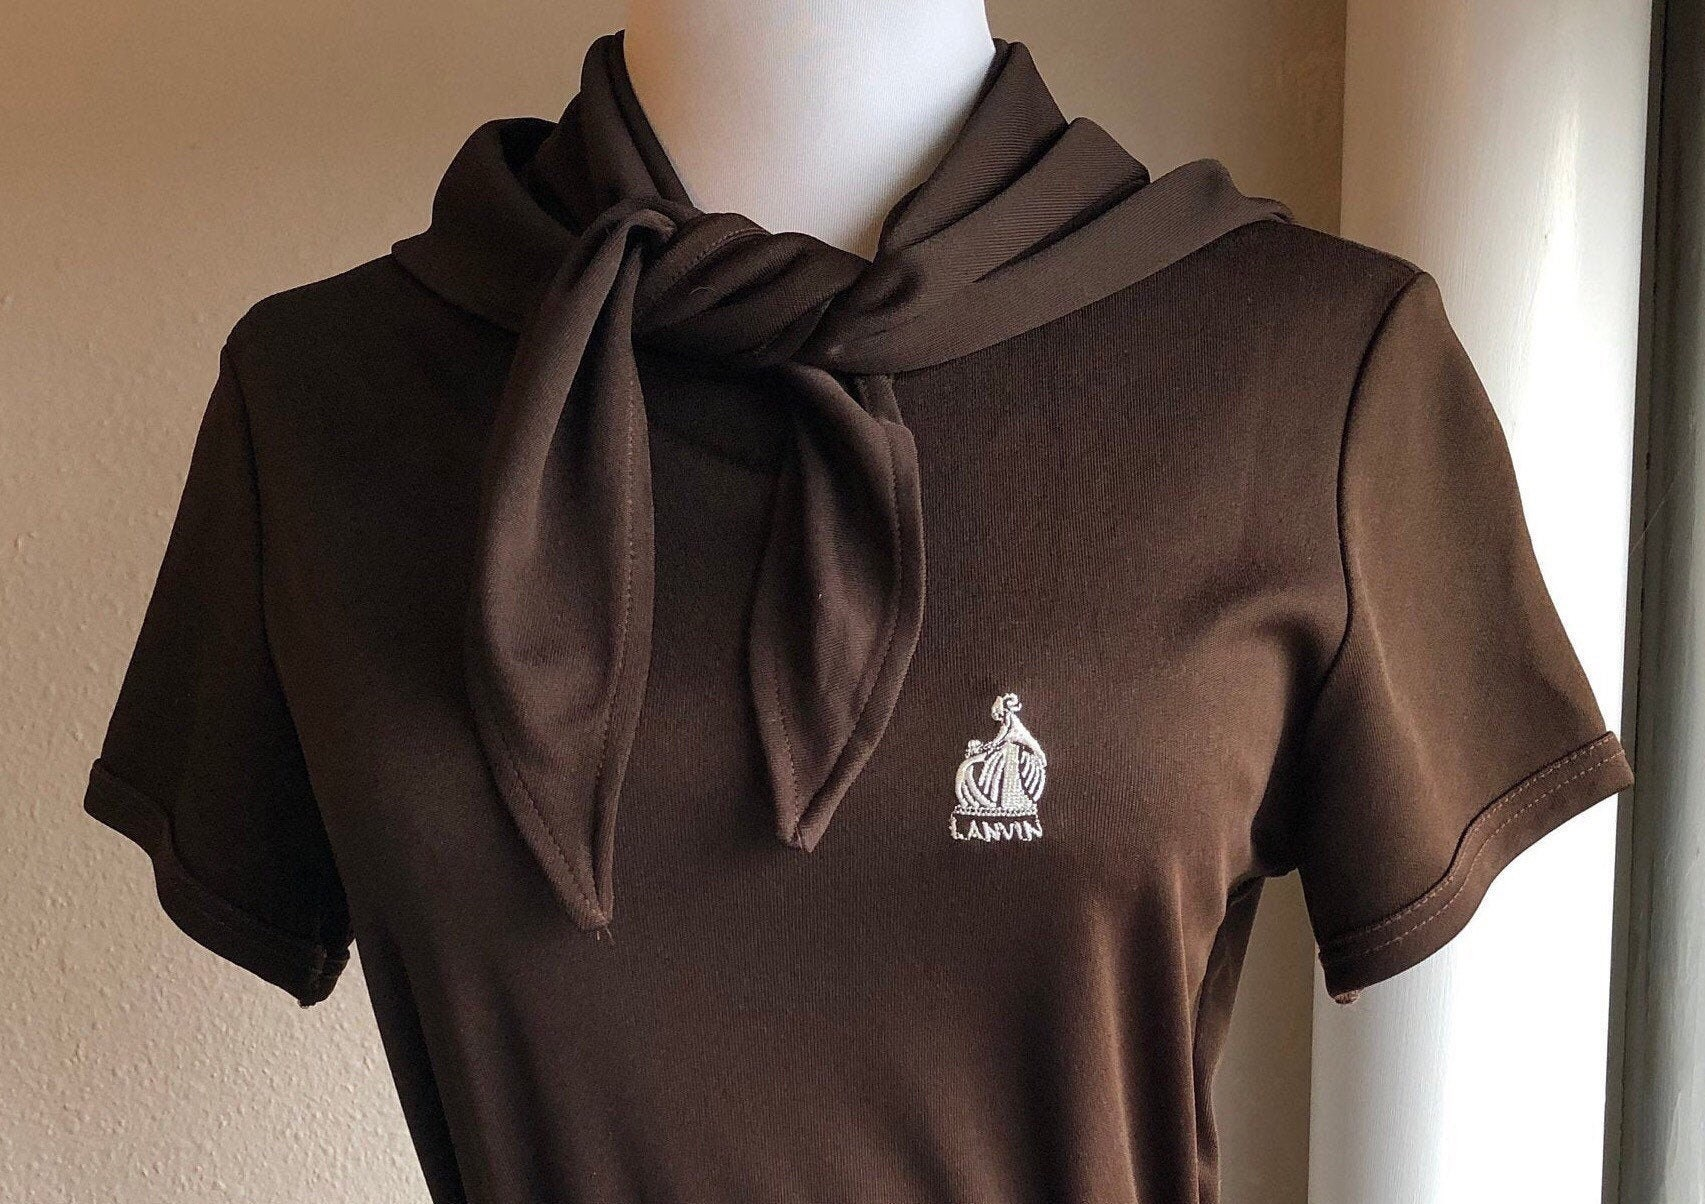 Vintage Scarf Styles -1920s to 1960s 70S Lanvin Paris New York Dark Brown Poly Jersey Knit Belted Scarf Tie T Shirt Dress Sz S 1970S Designer Vintage Embroidered Logo Short Slv $148.00 AT vintagedancer.com